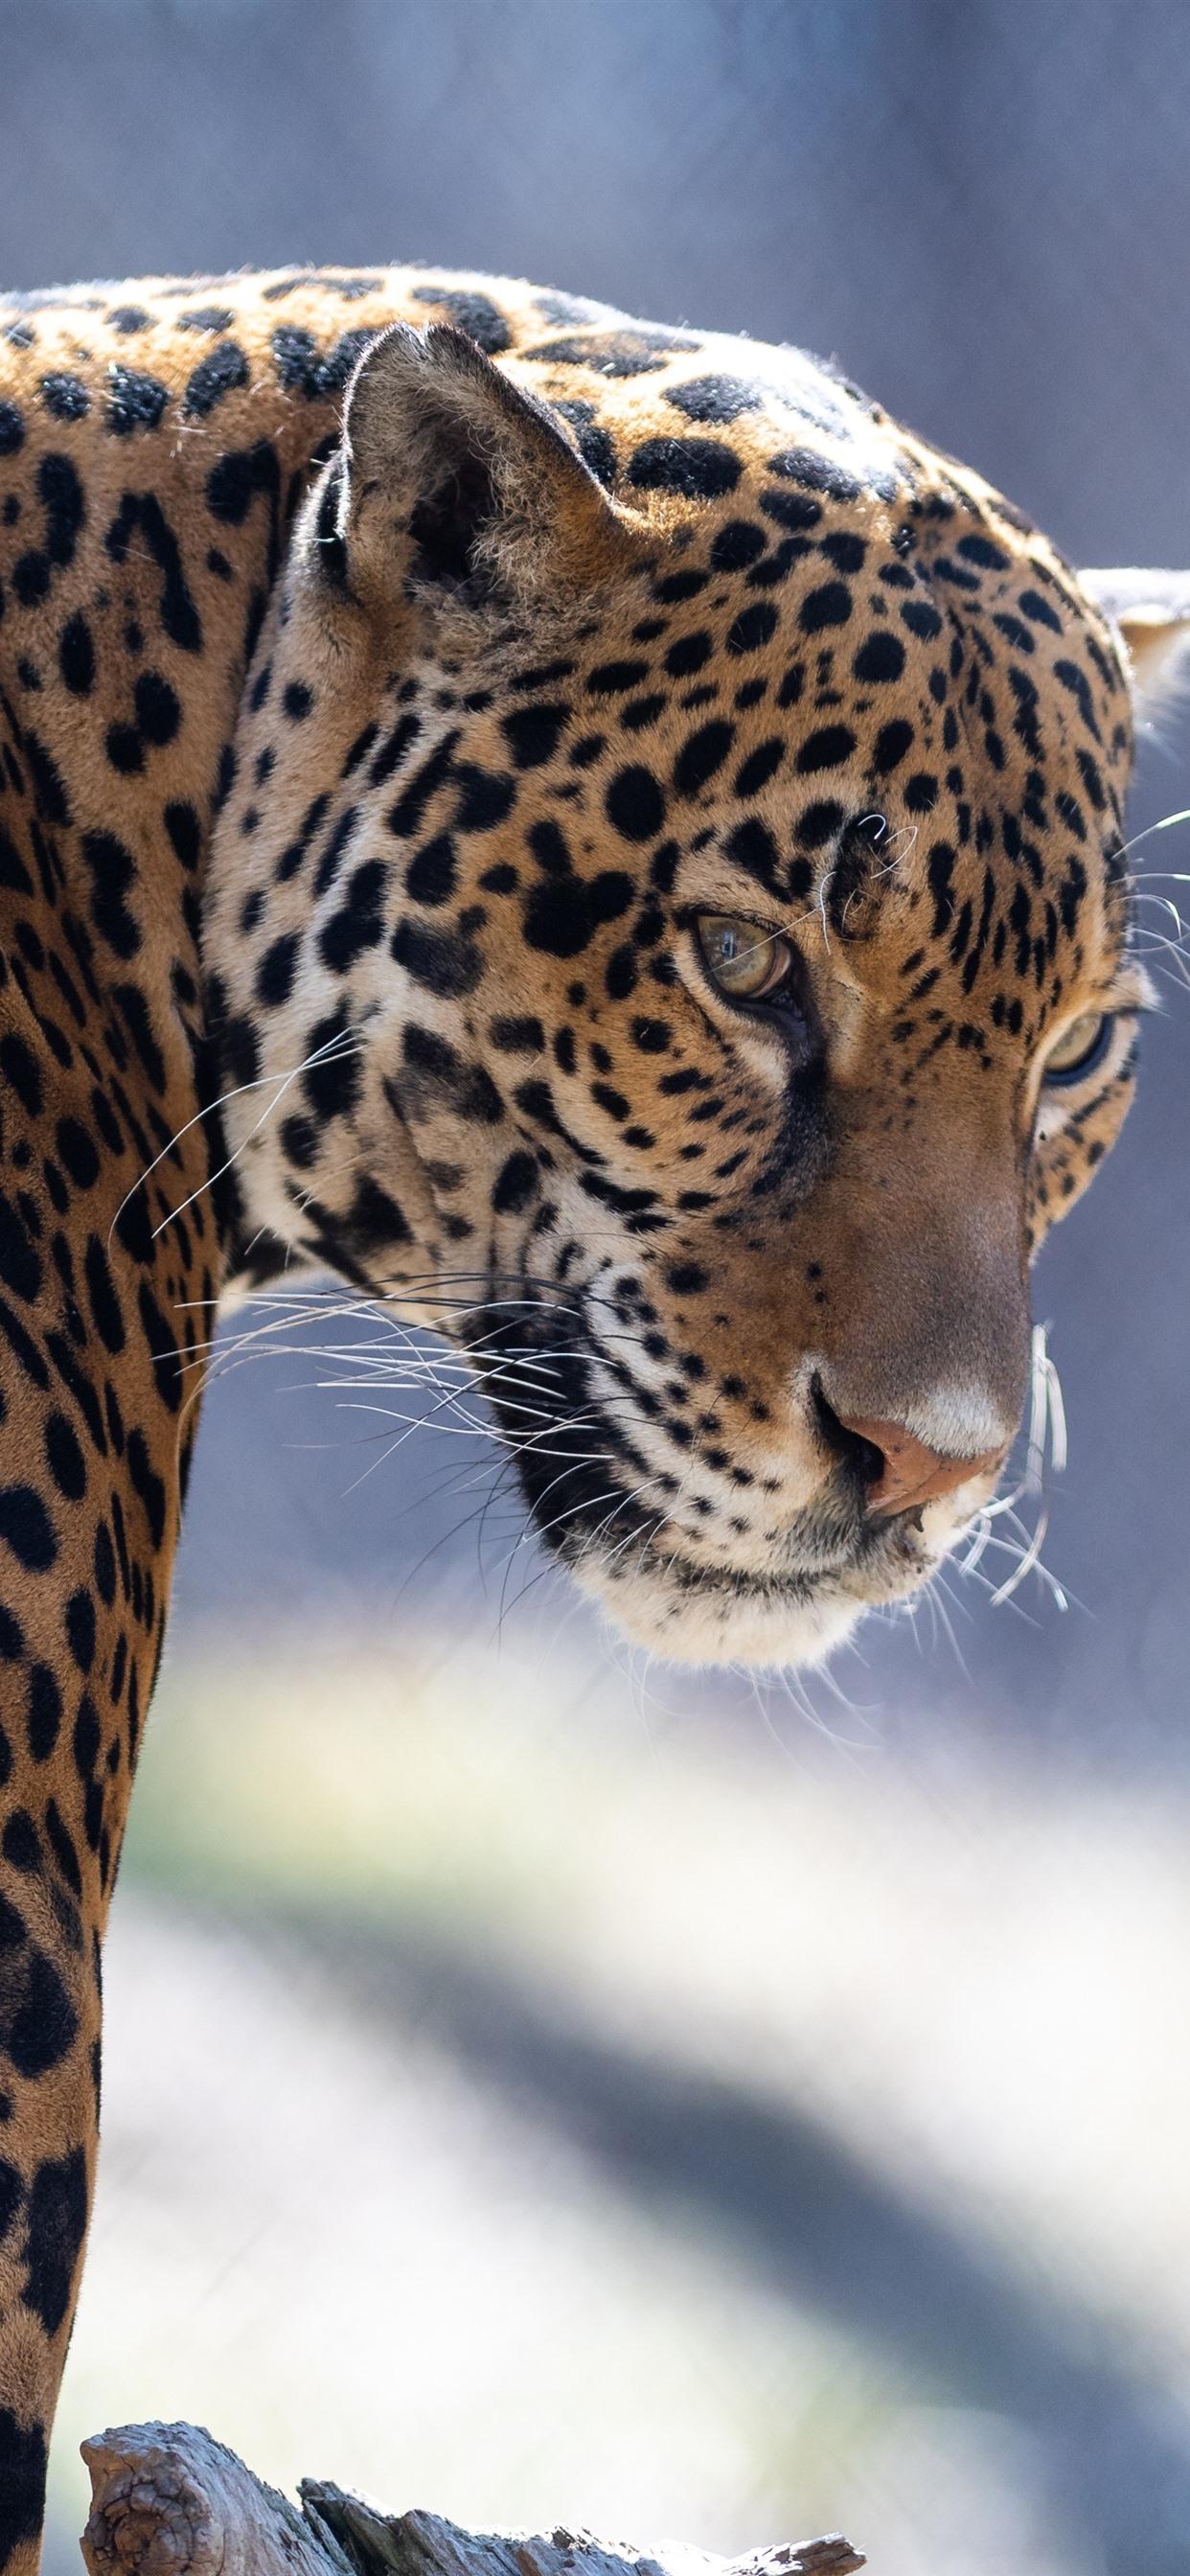 Zoo Animal Jaguar Look Back 1242x2688 Iphone Xs Max